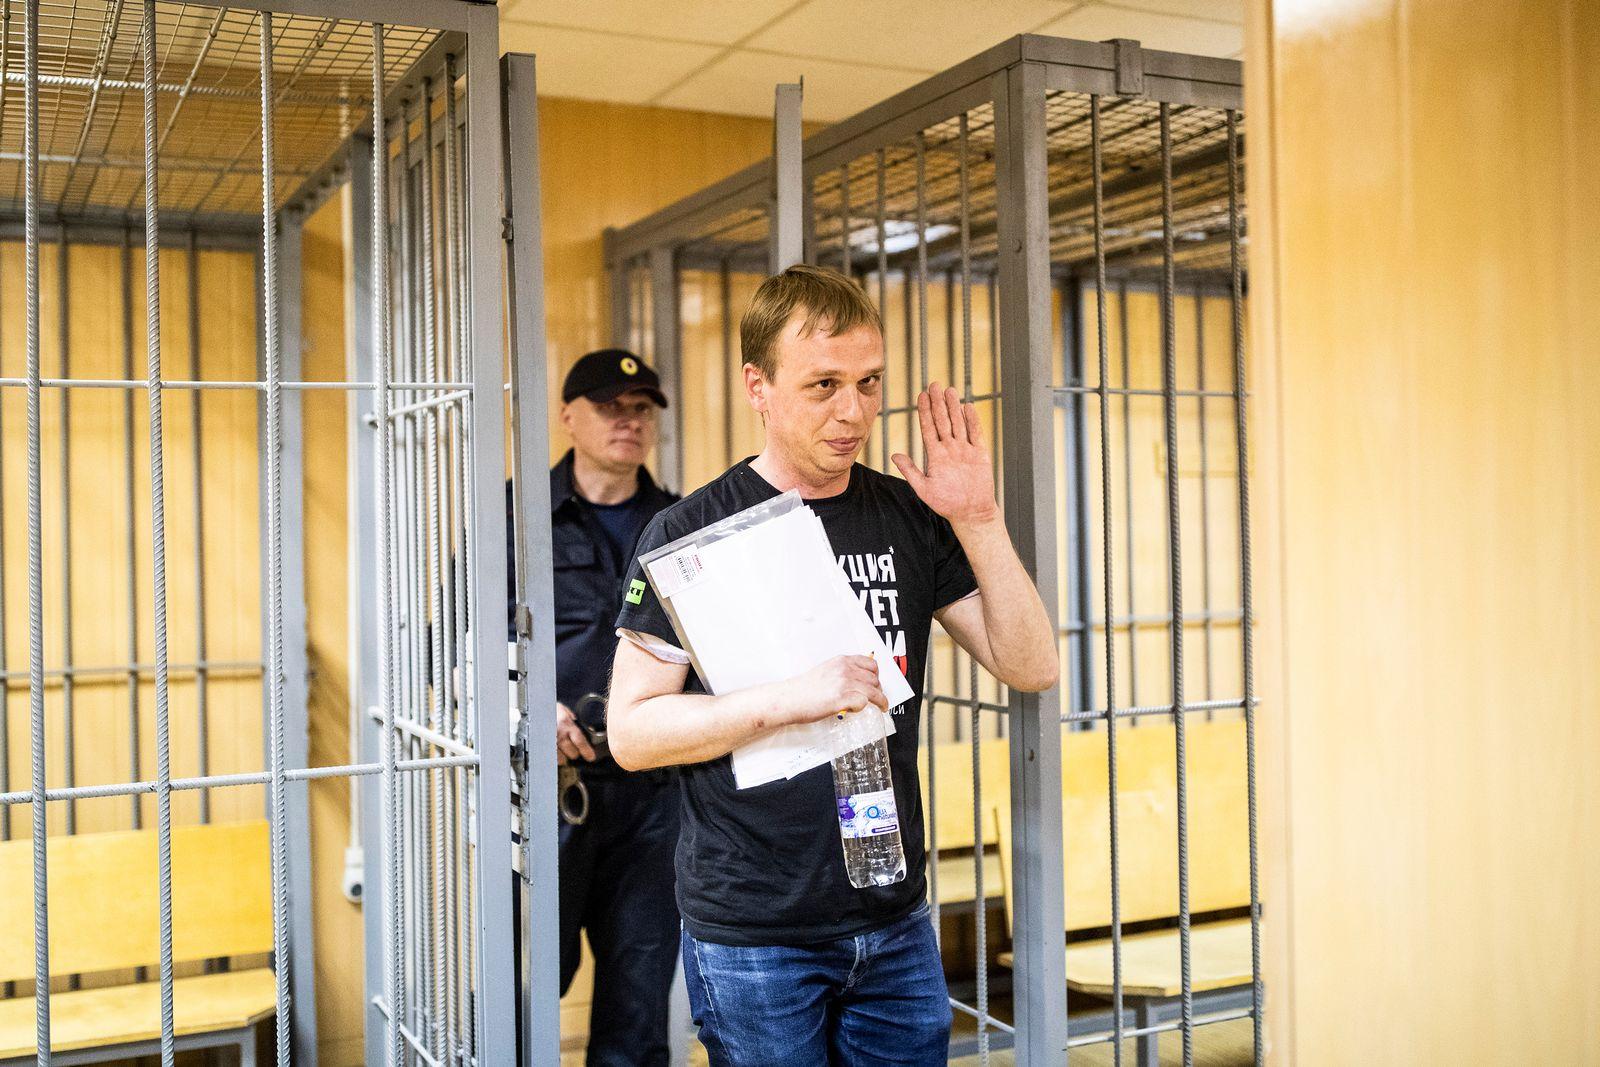 Iwan Golunow